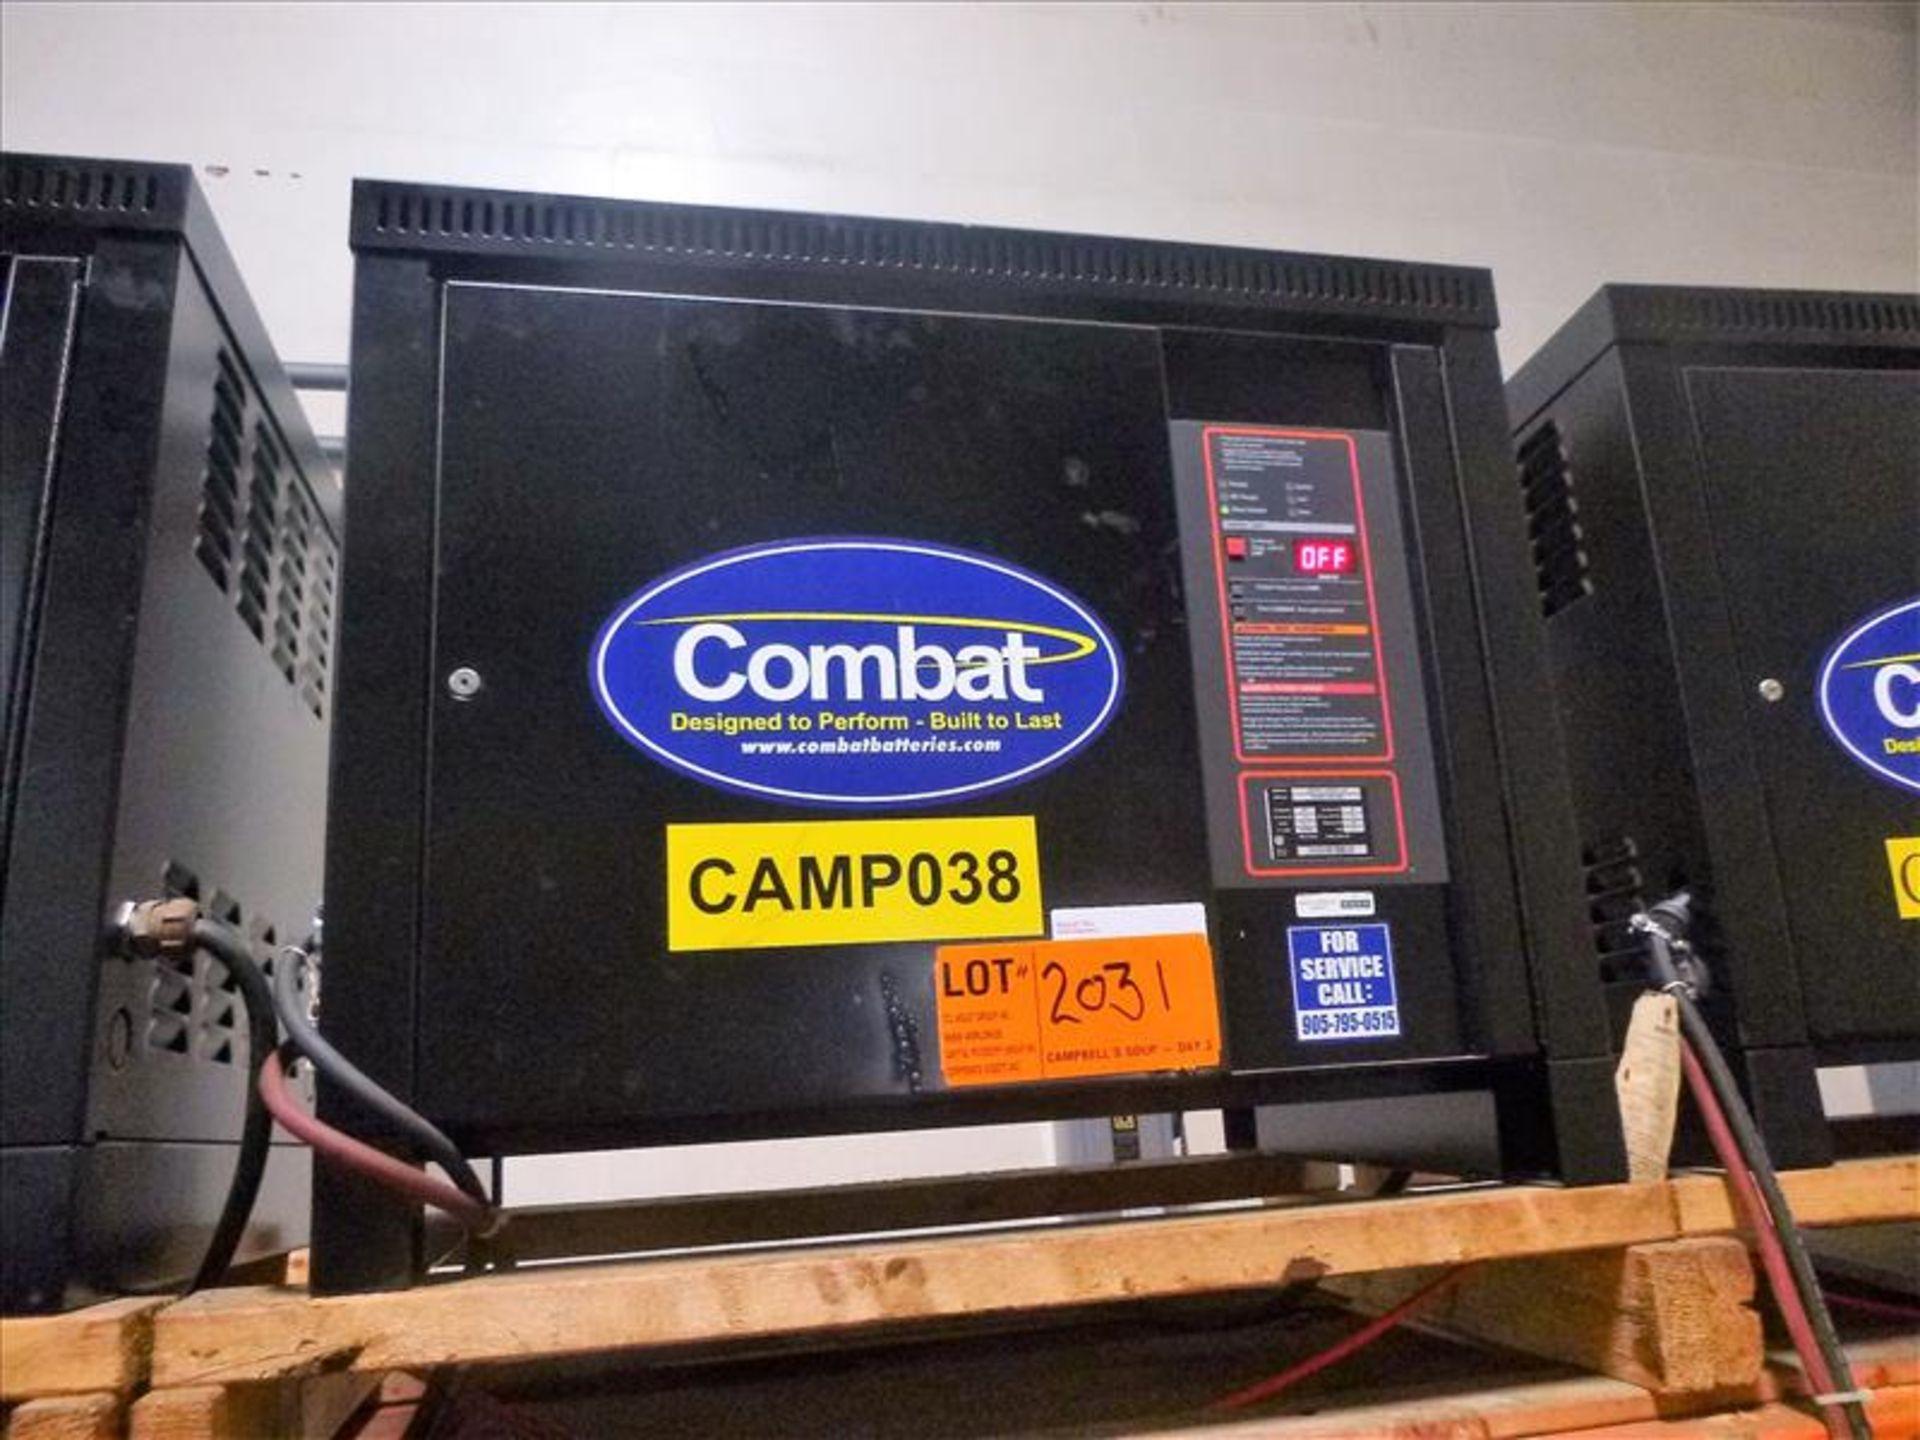 Lot 2031 - Combat battery charger, 48V [Material Handling]